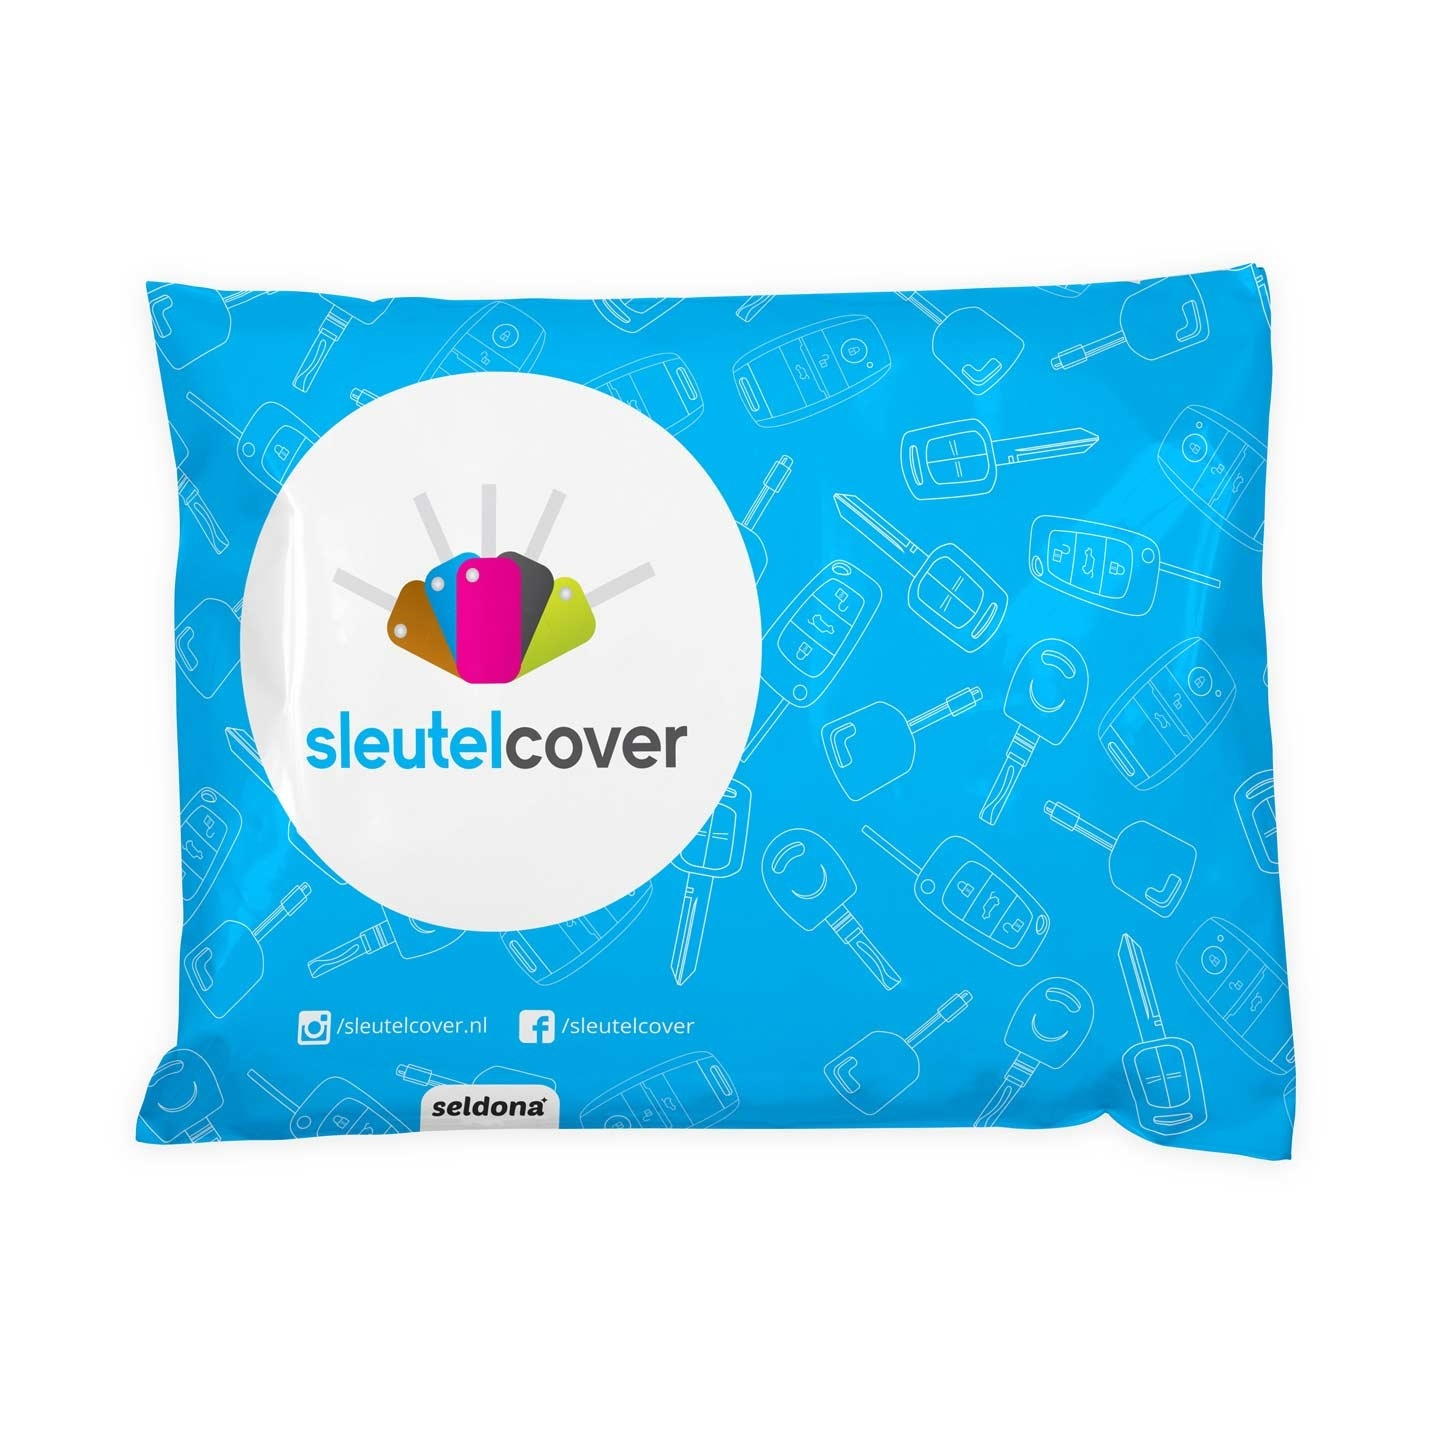 Seat SleutelCover - Paars / Silicone sleutelhoesje / beschermhoesje autosleutel